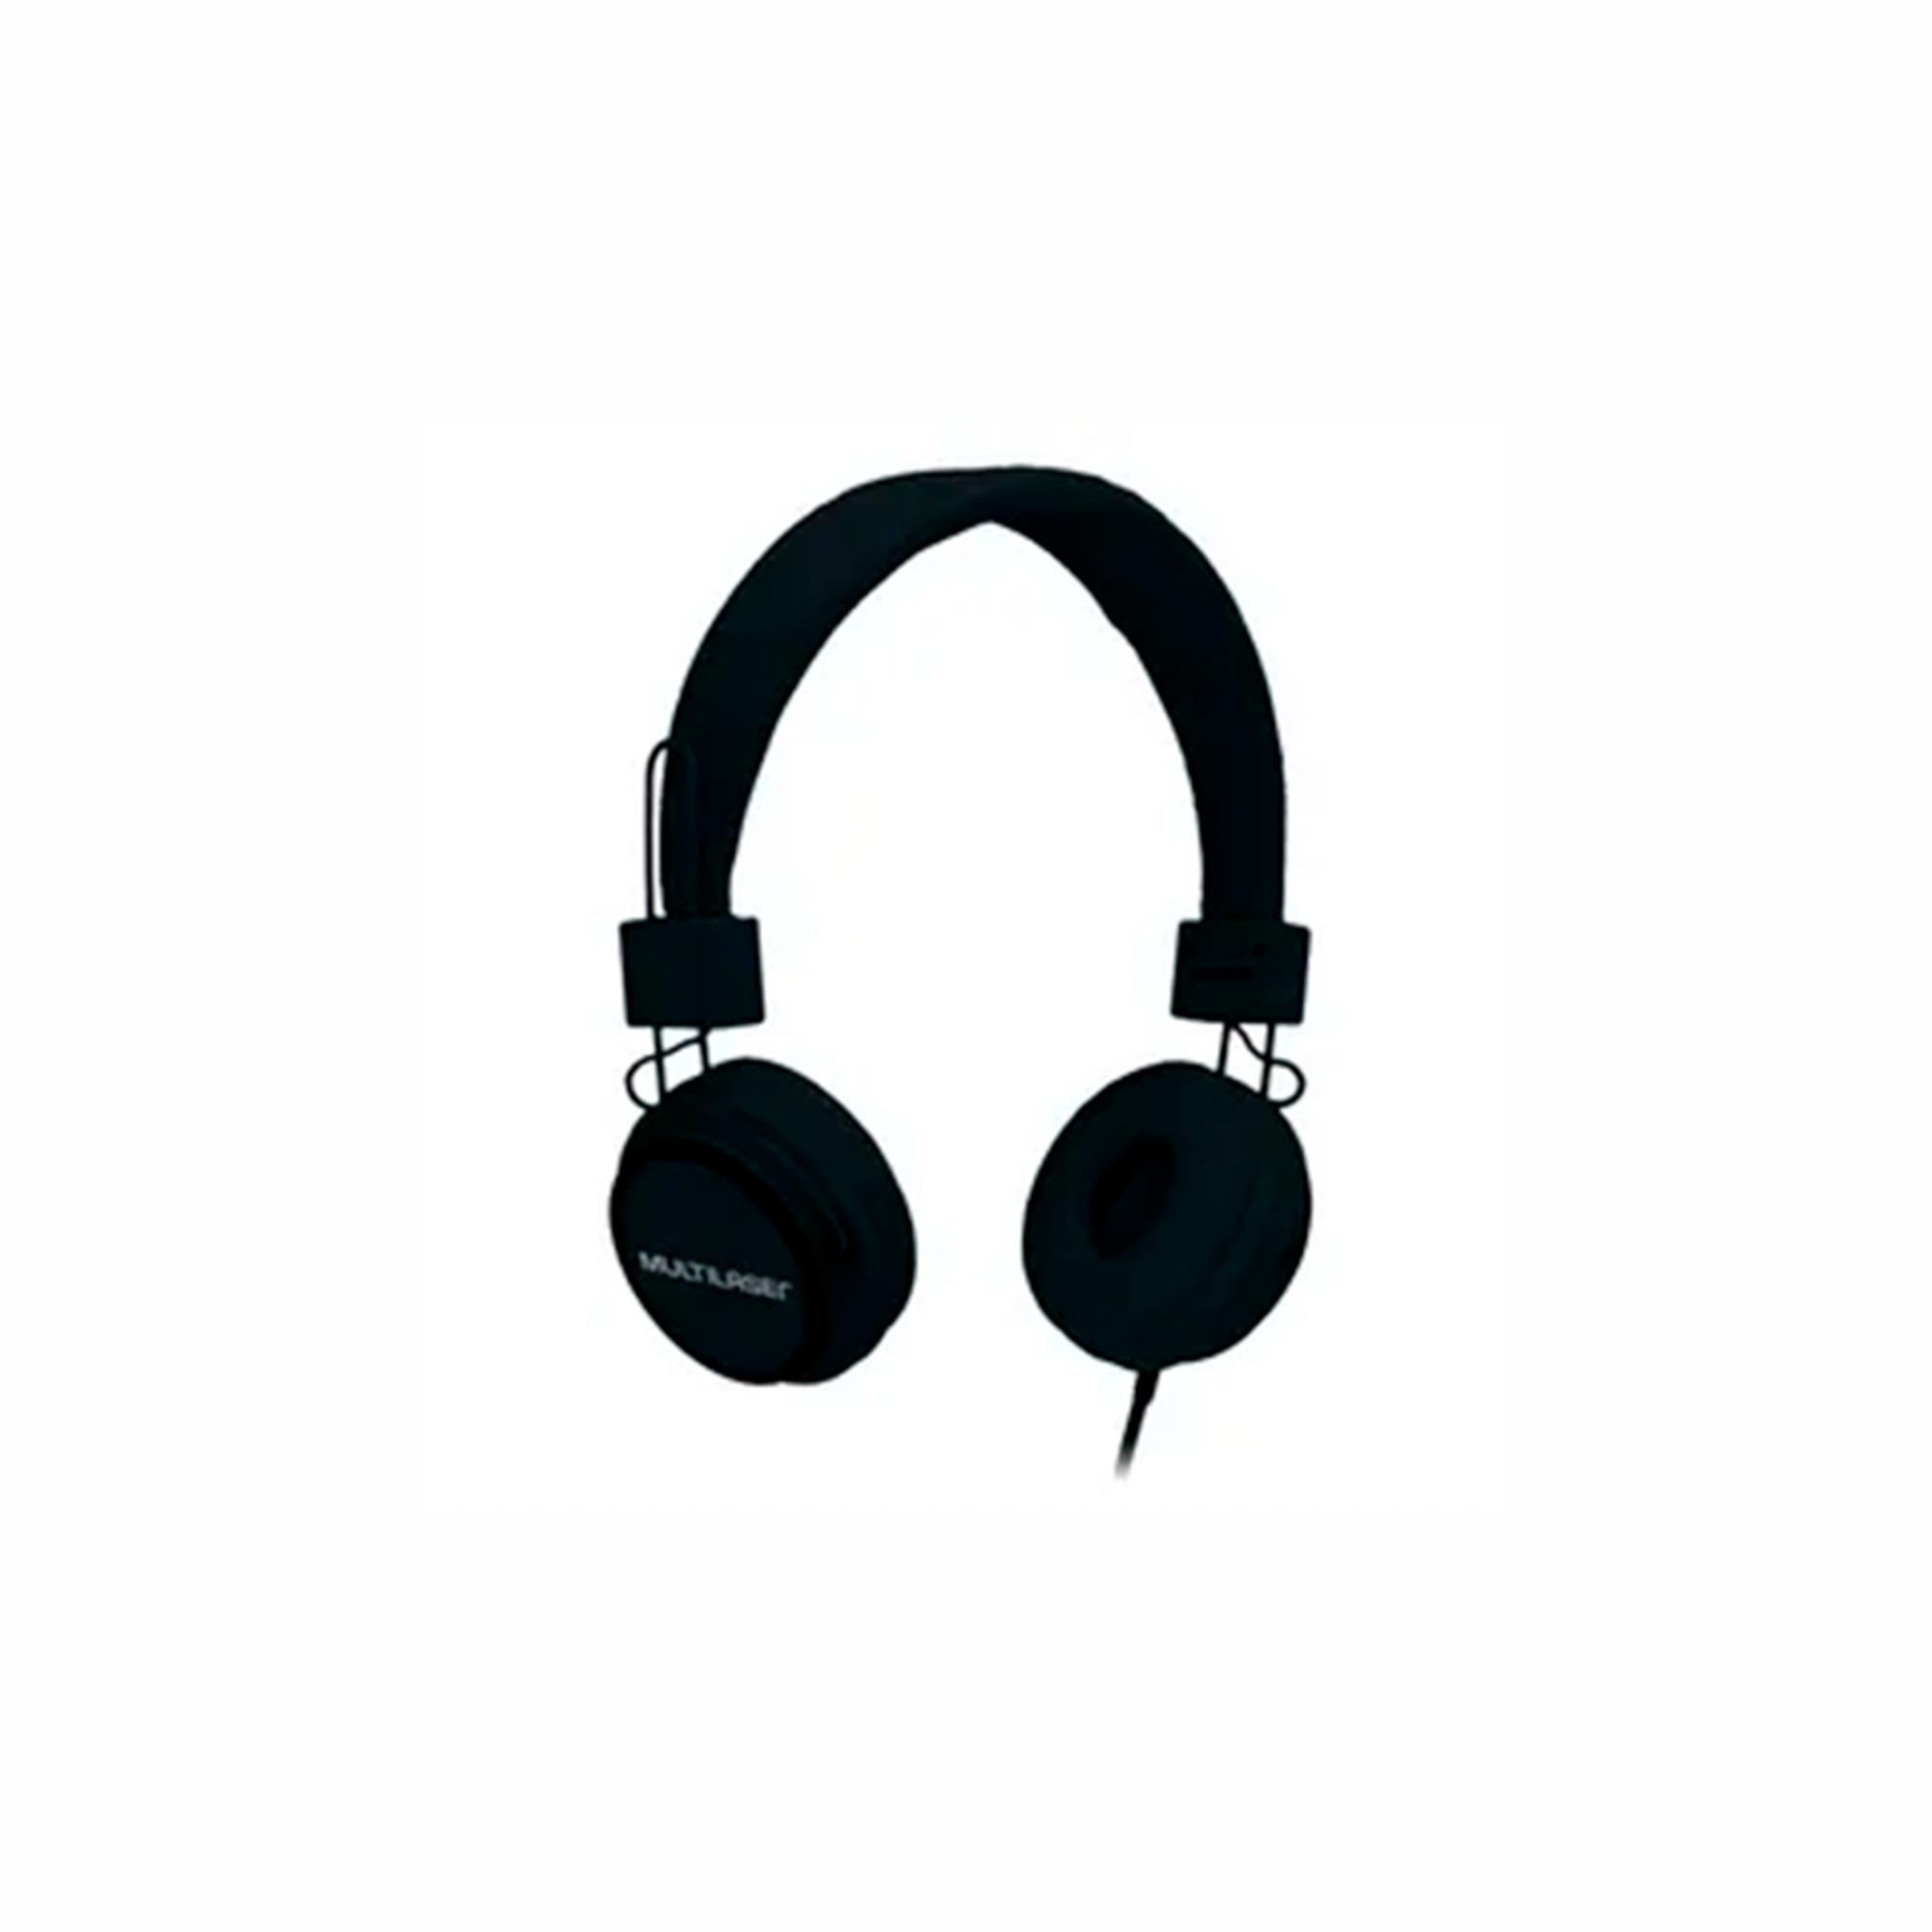 FONE HEADPHONE FUN PH115 PRETO MULTILASE